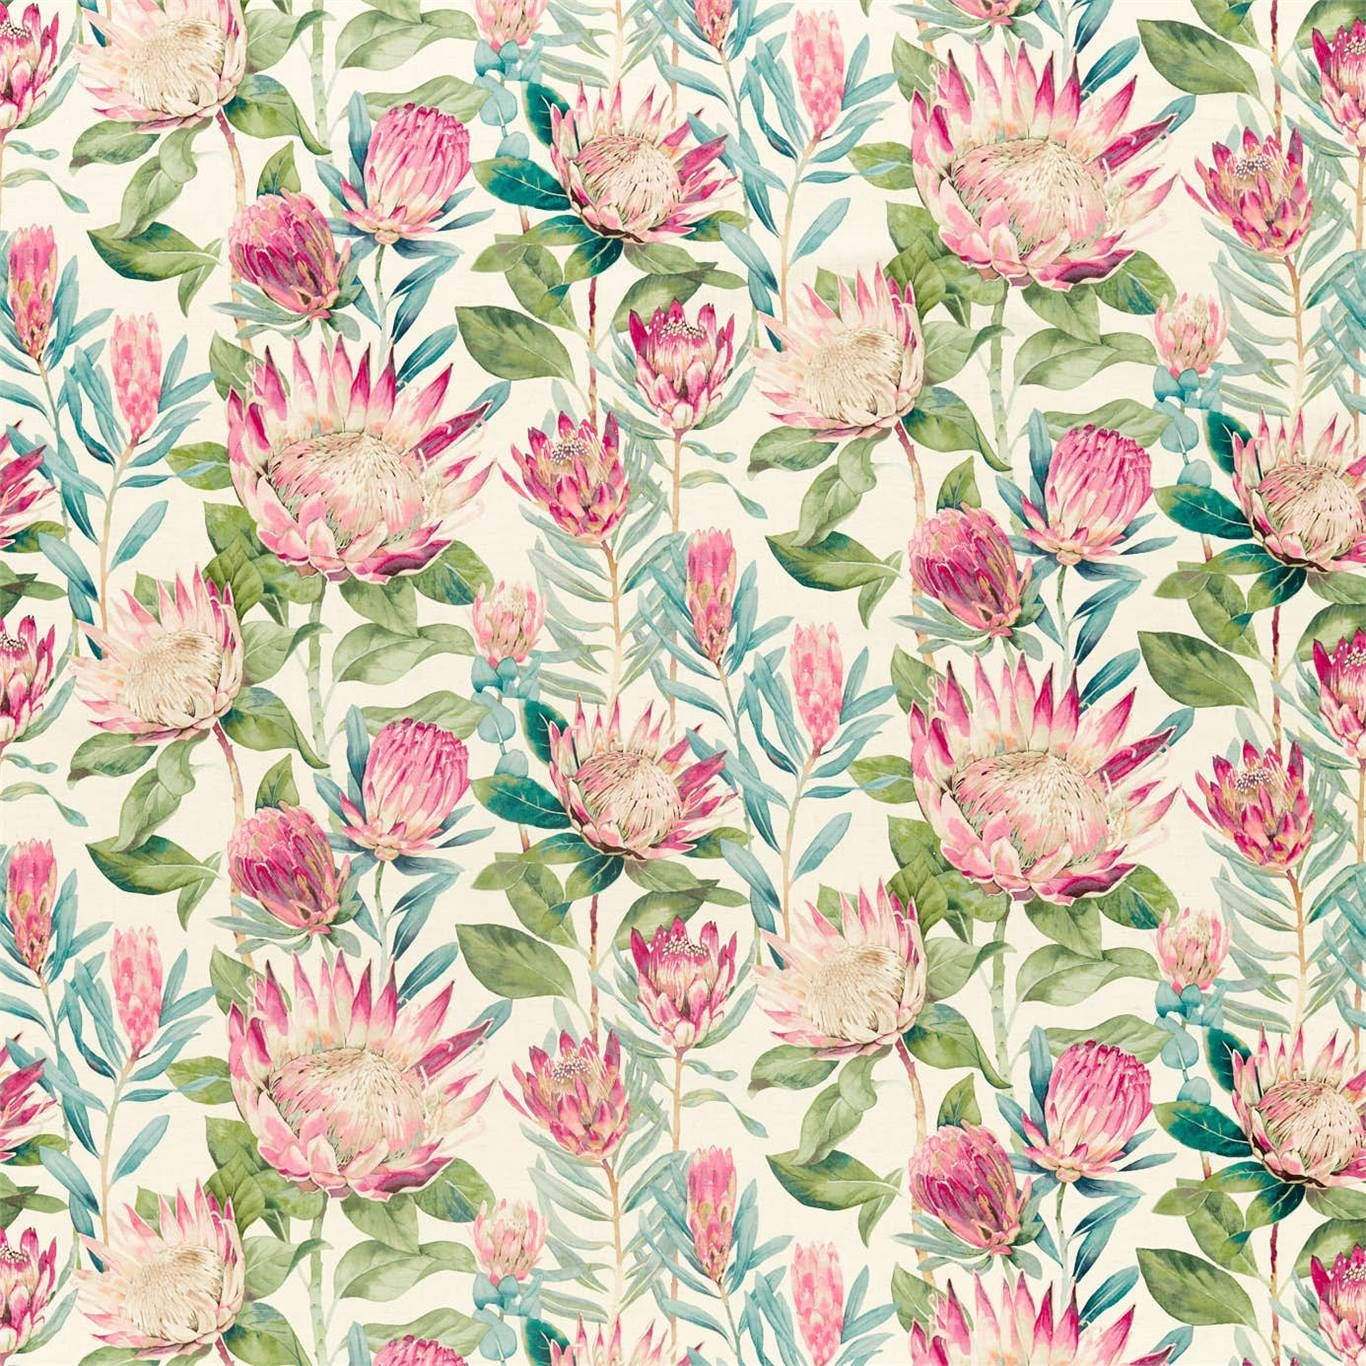 King Protea 226573 In 2020 King Protea Cream Wallpaper Protea Flower